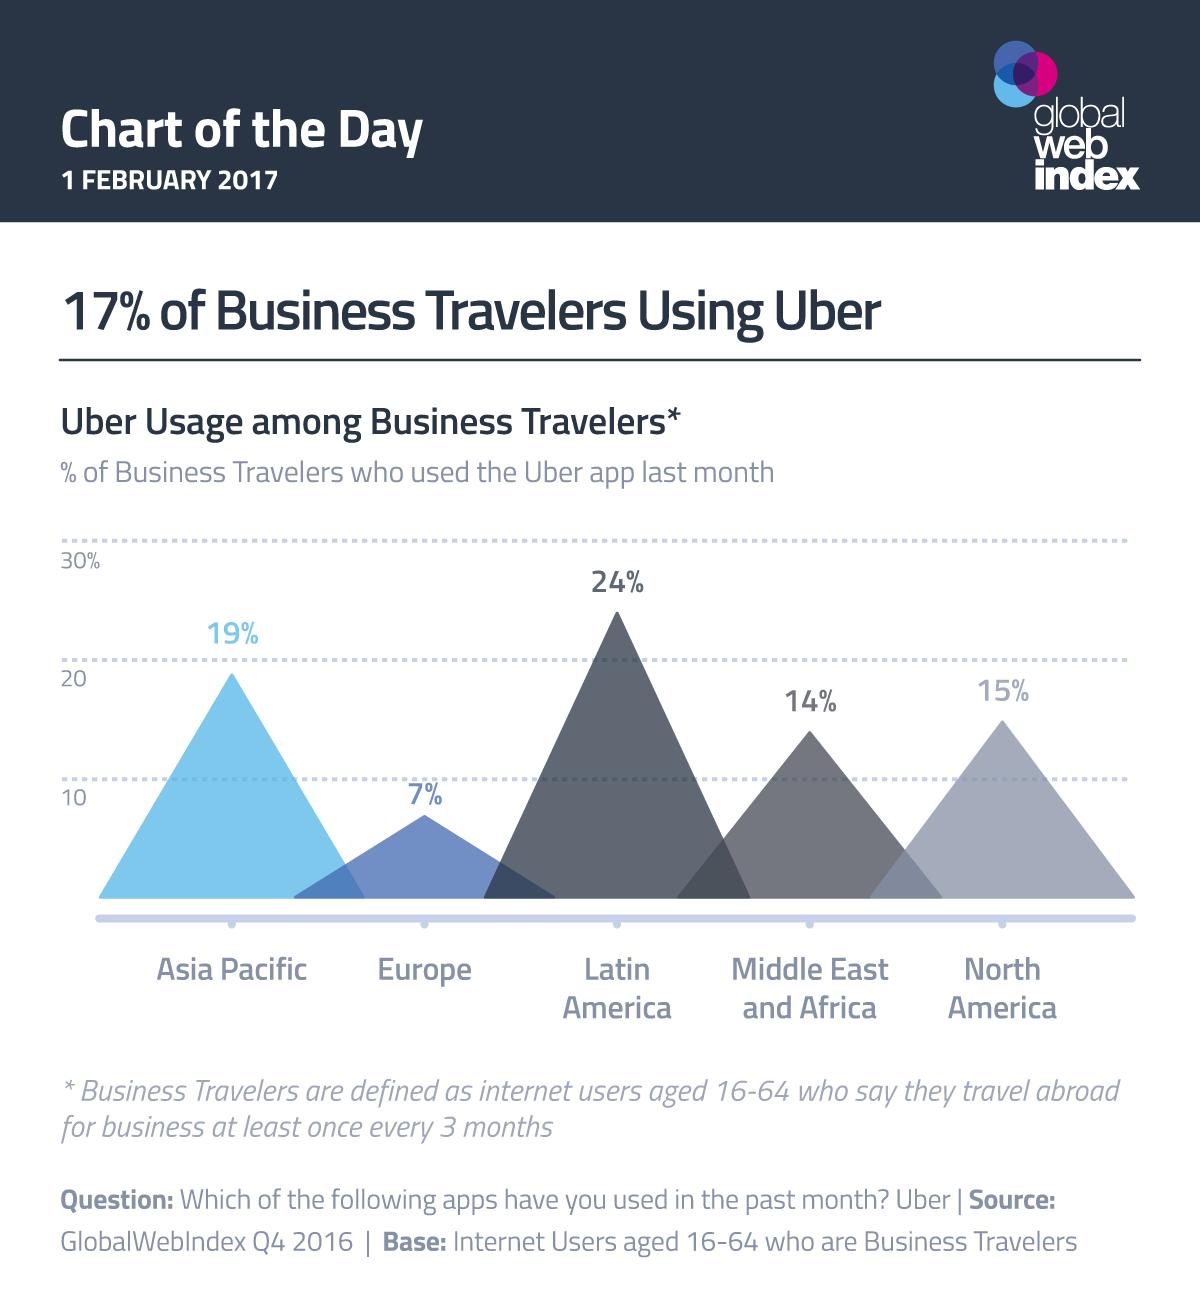 17% of Business Travelers Using Uber